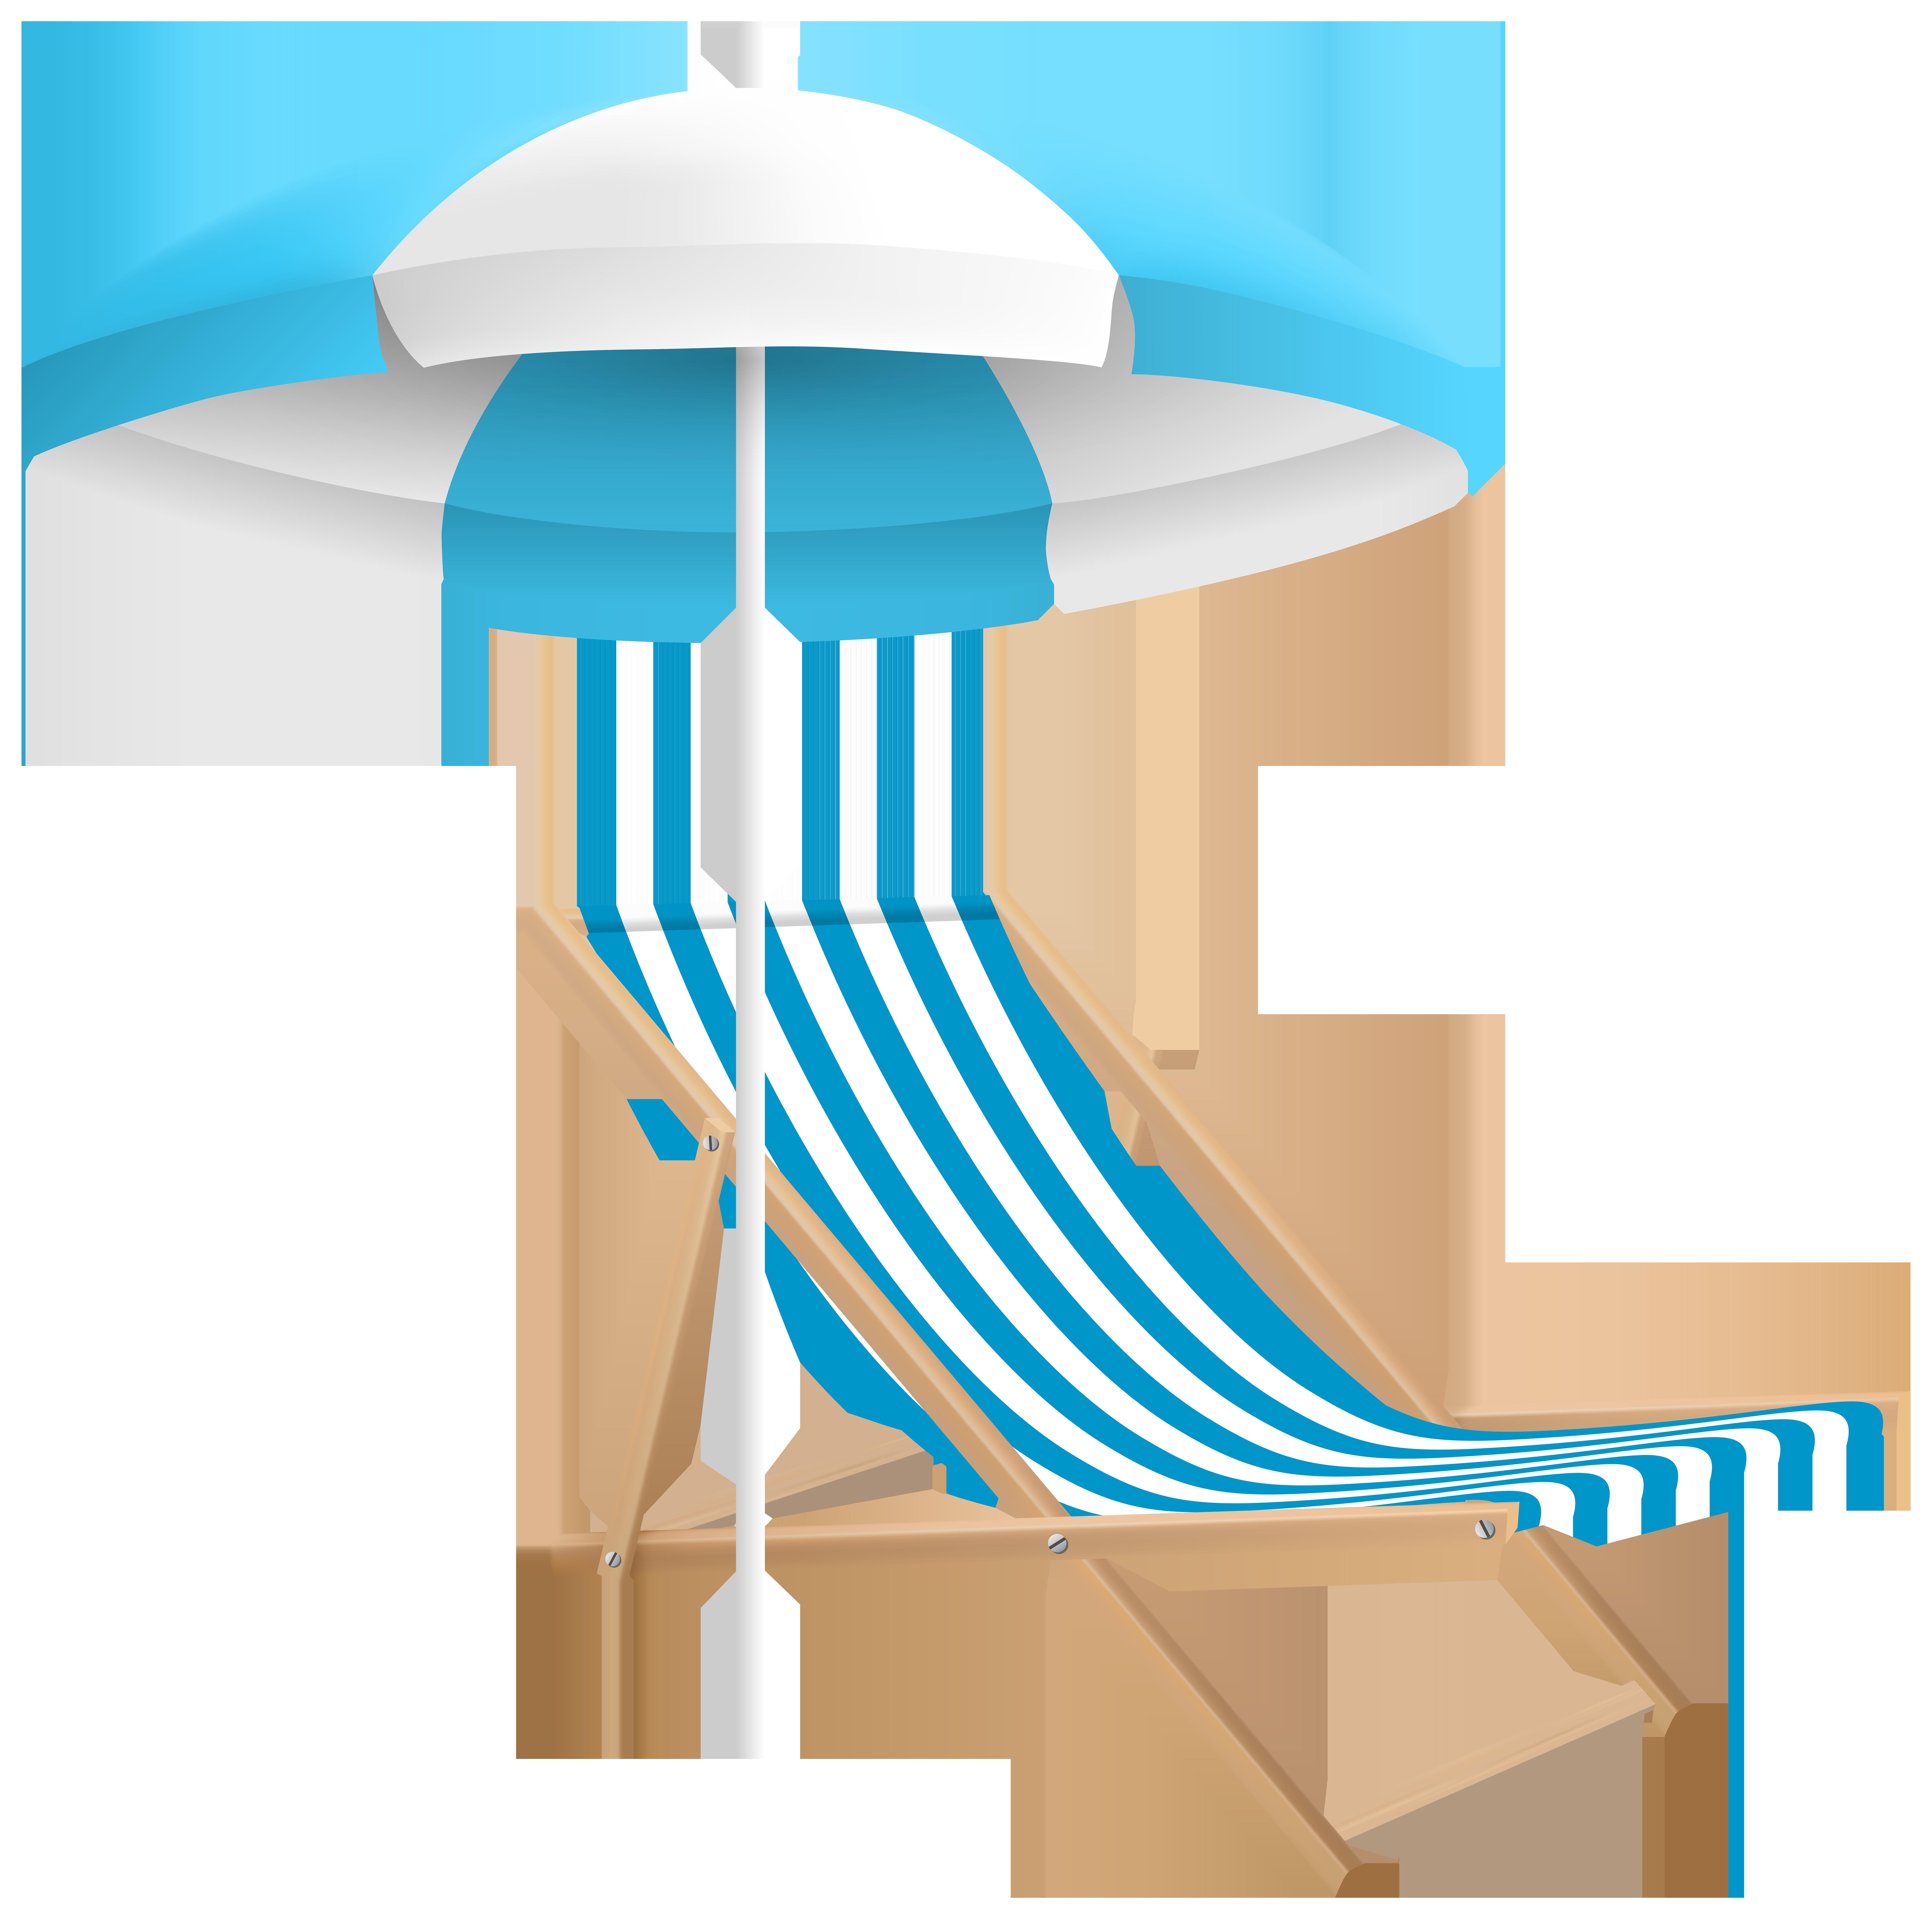 Beach Chair And Umbrella Png & Free Beach Chair And Umbrella.